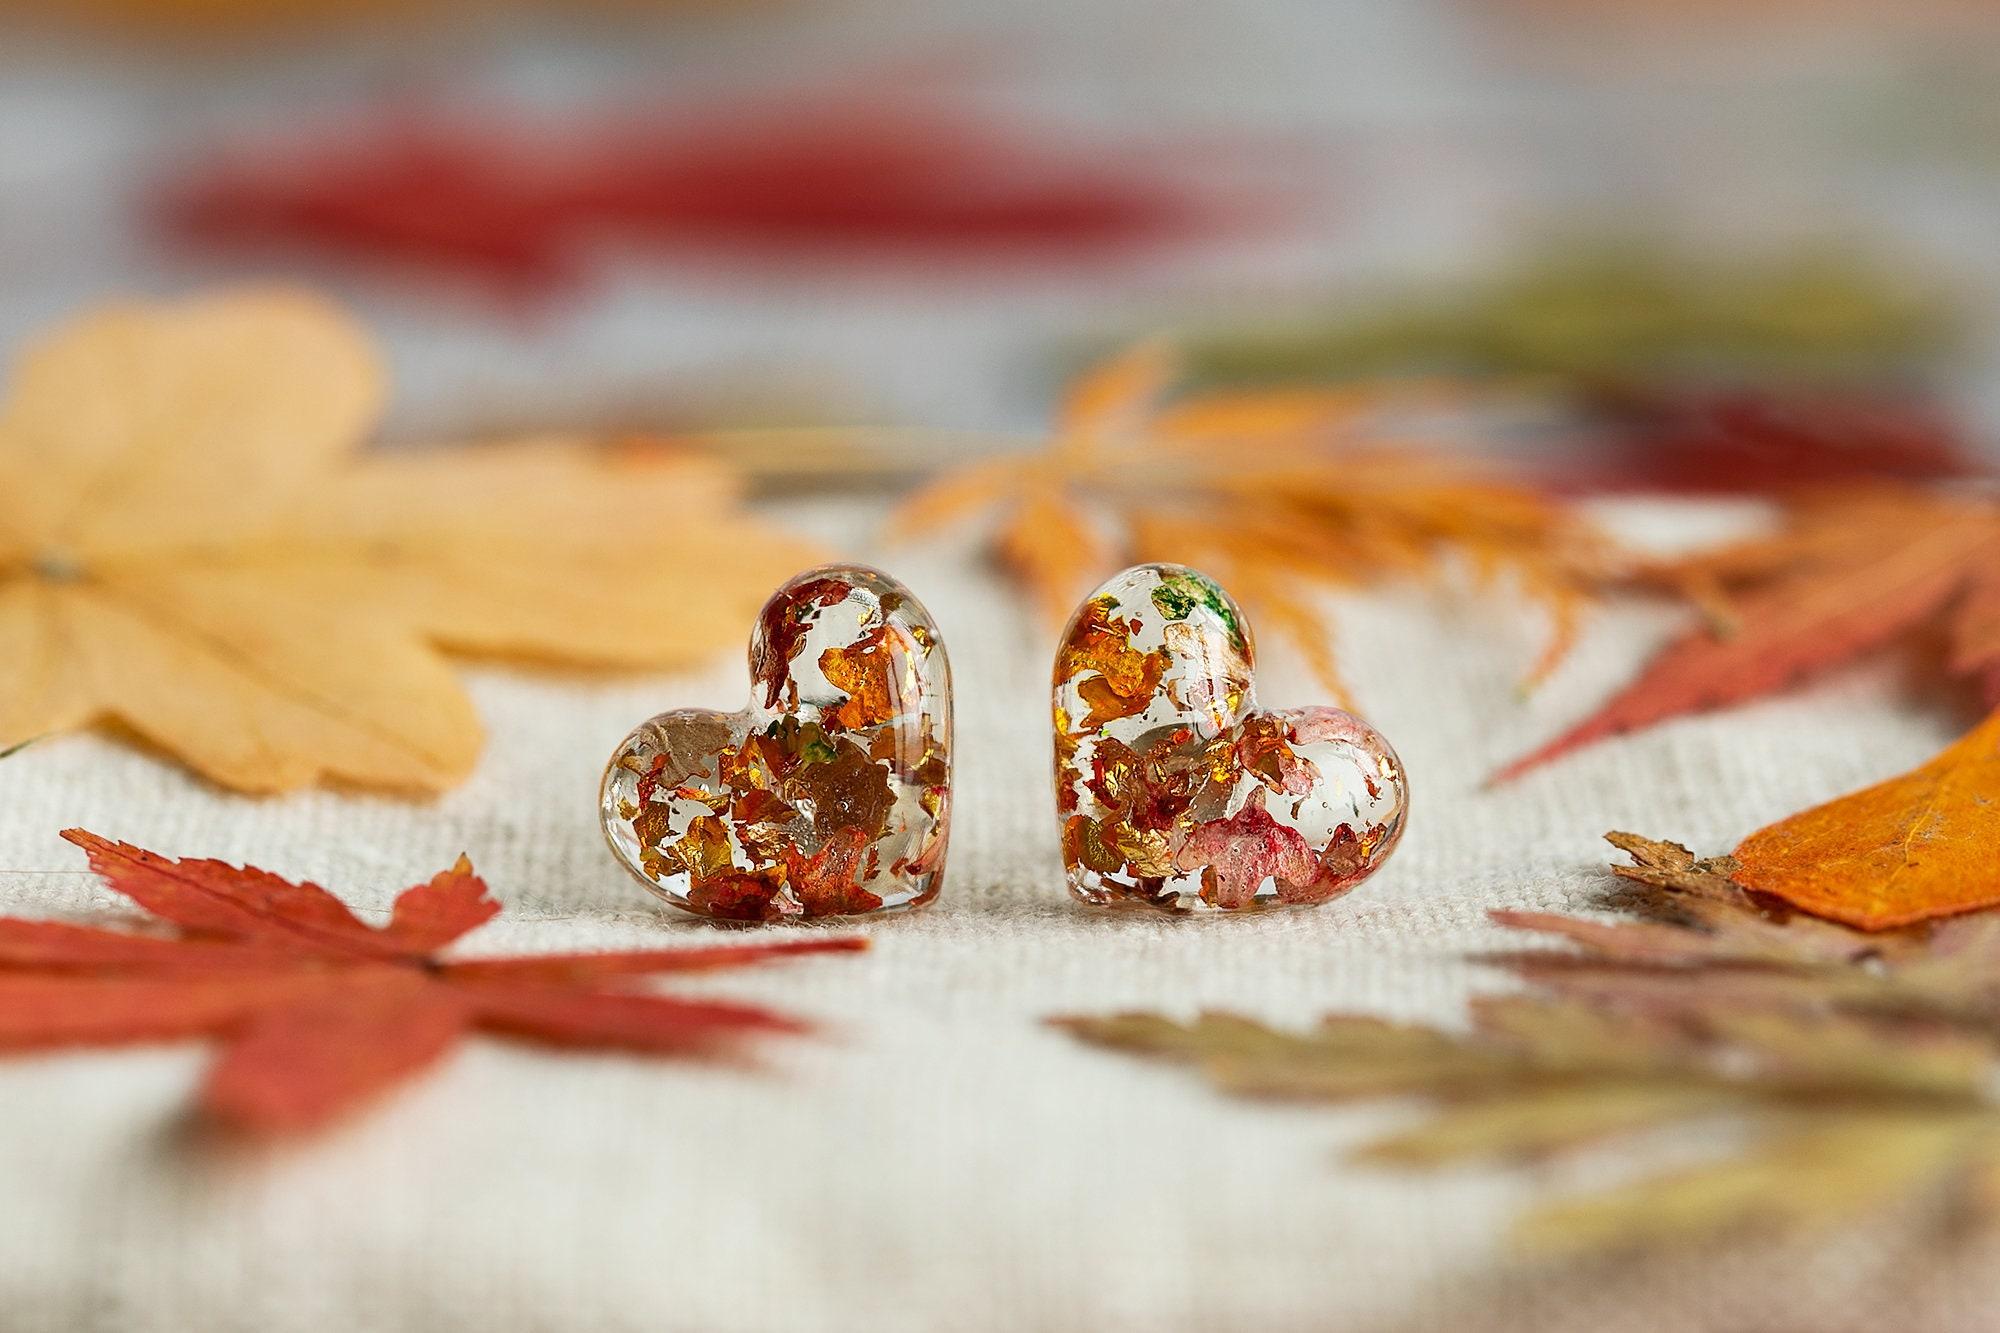 Autumn Earrings Four Seasons Earring Studs Pressed